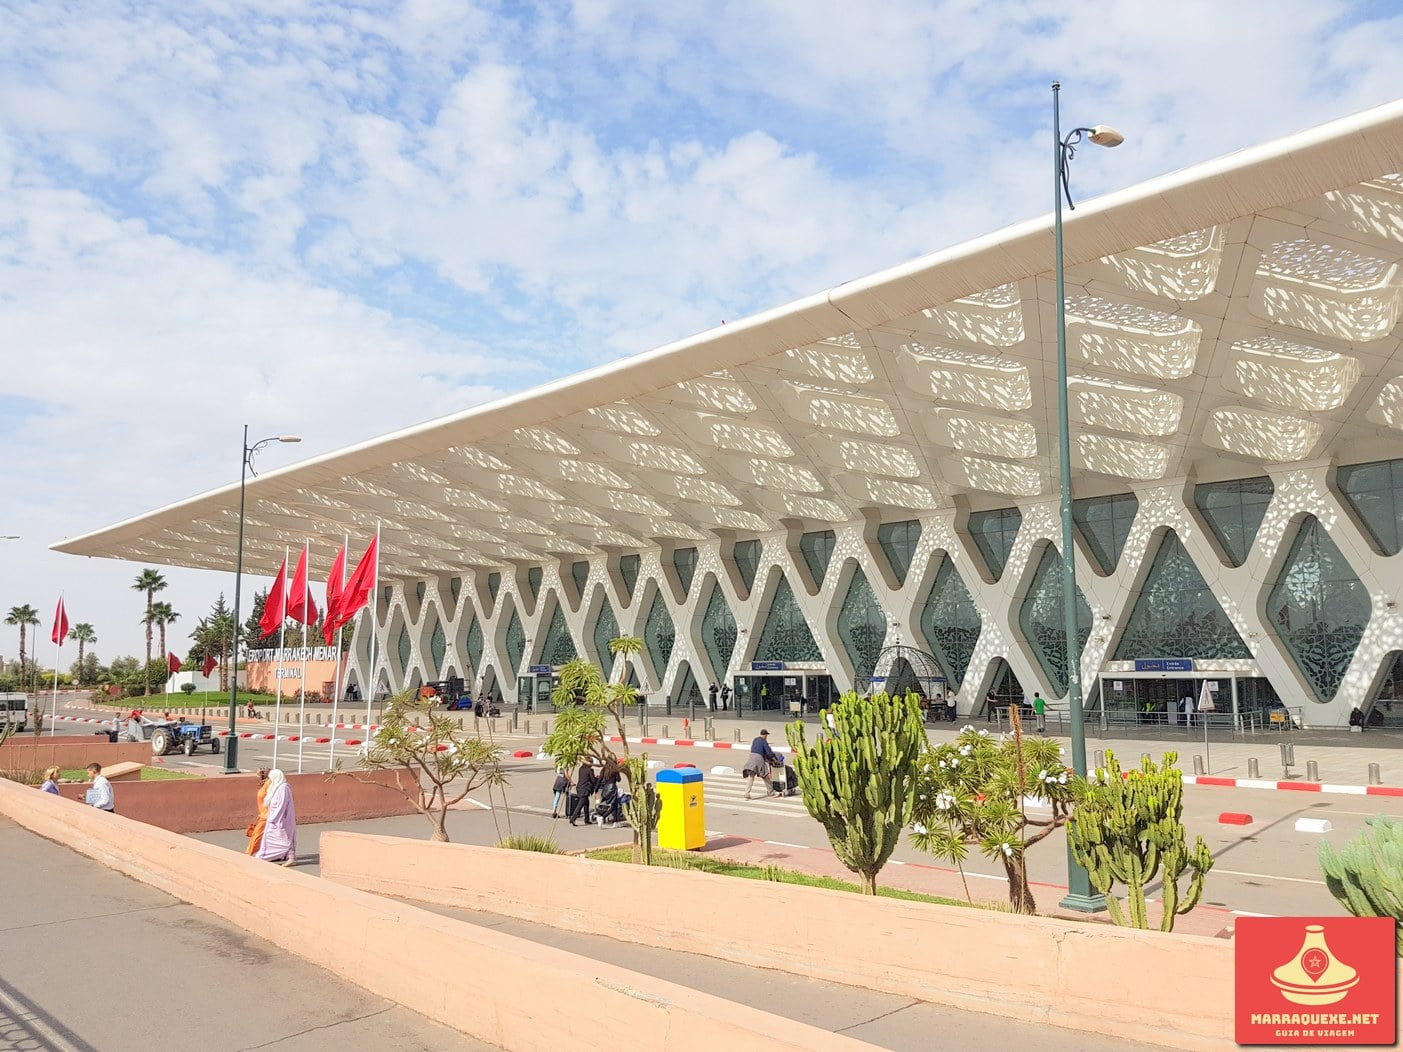 Aeroporto de Marraquexe vai adquirir portões electrónicos